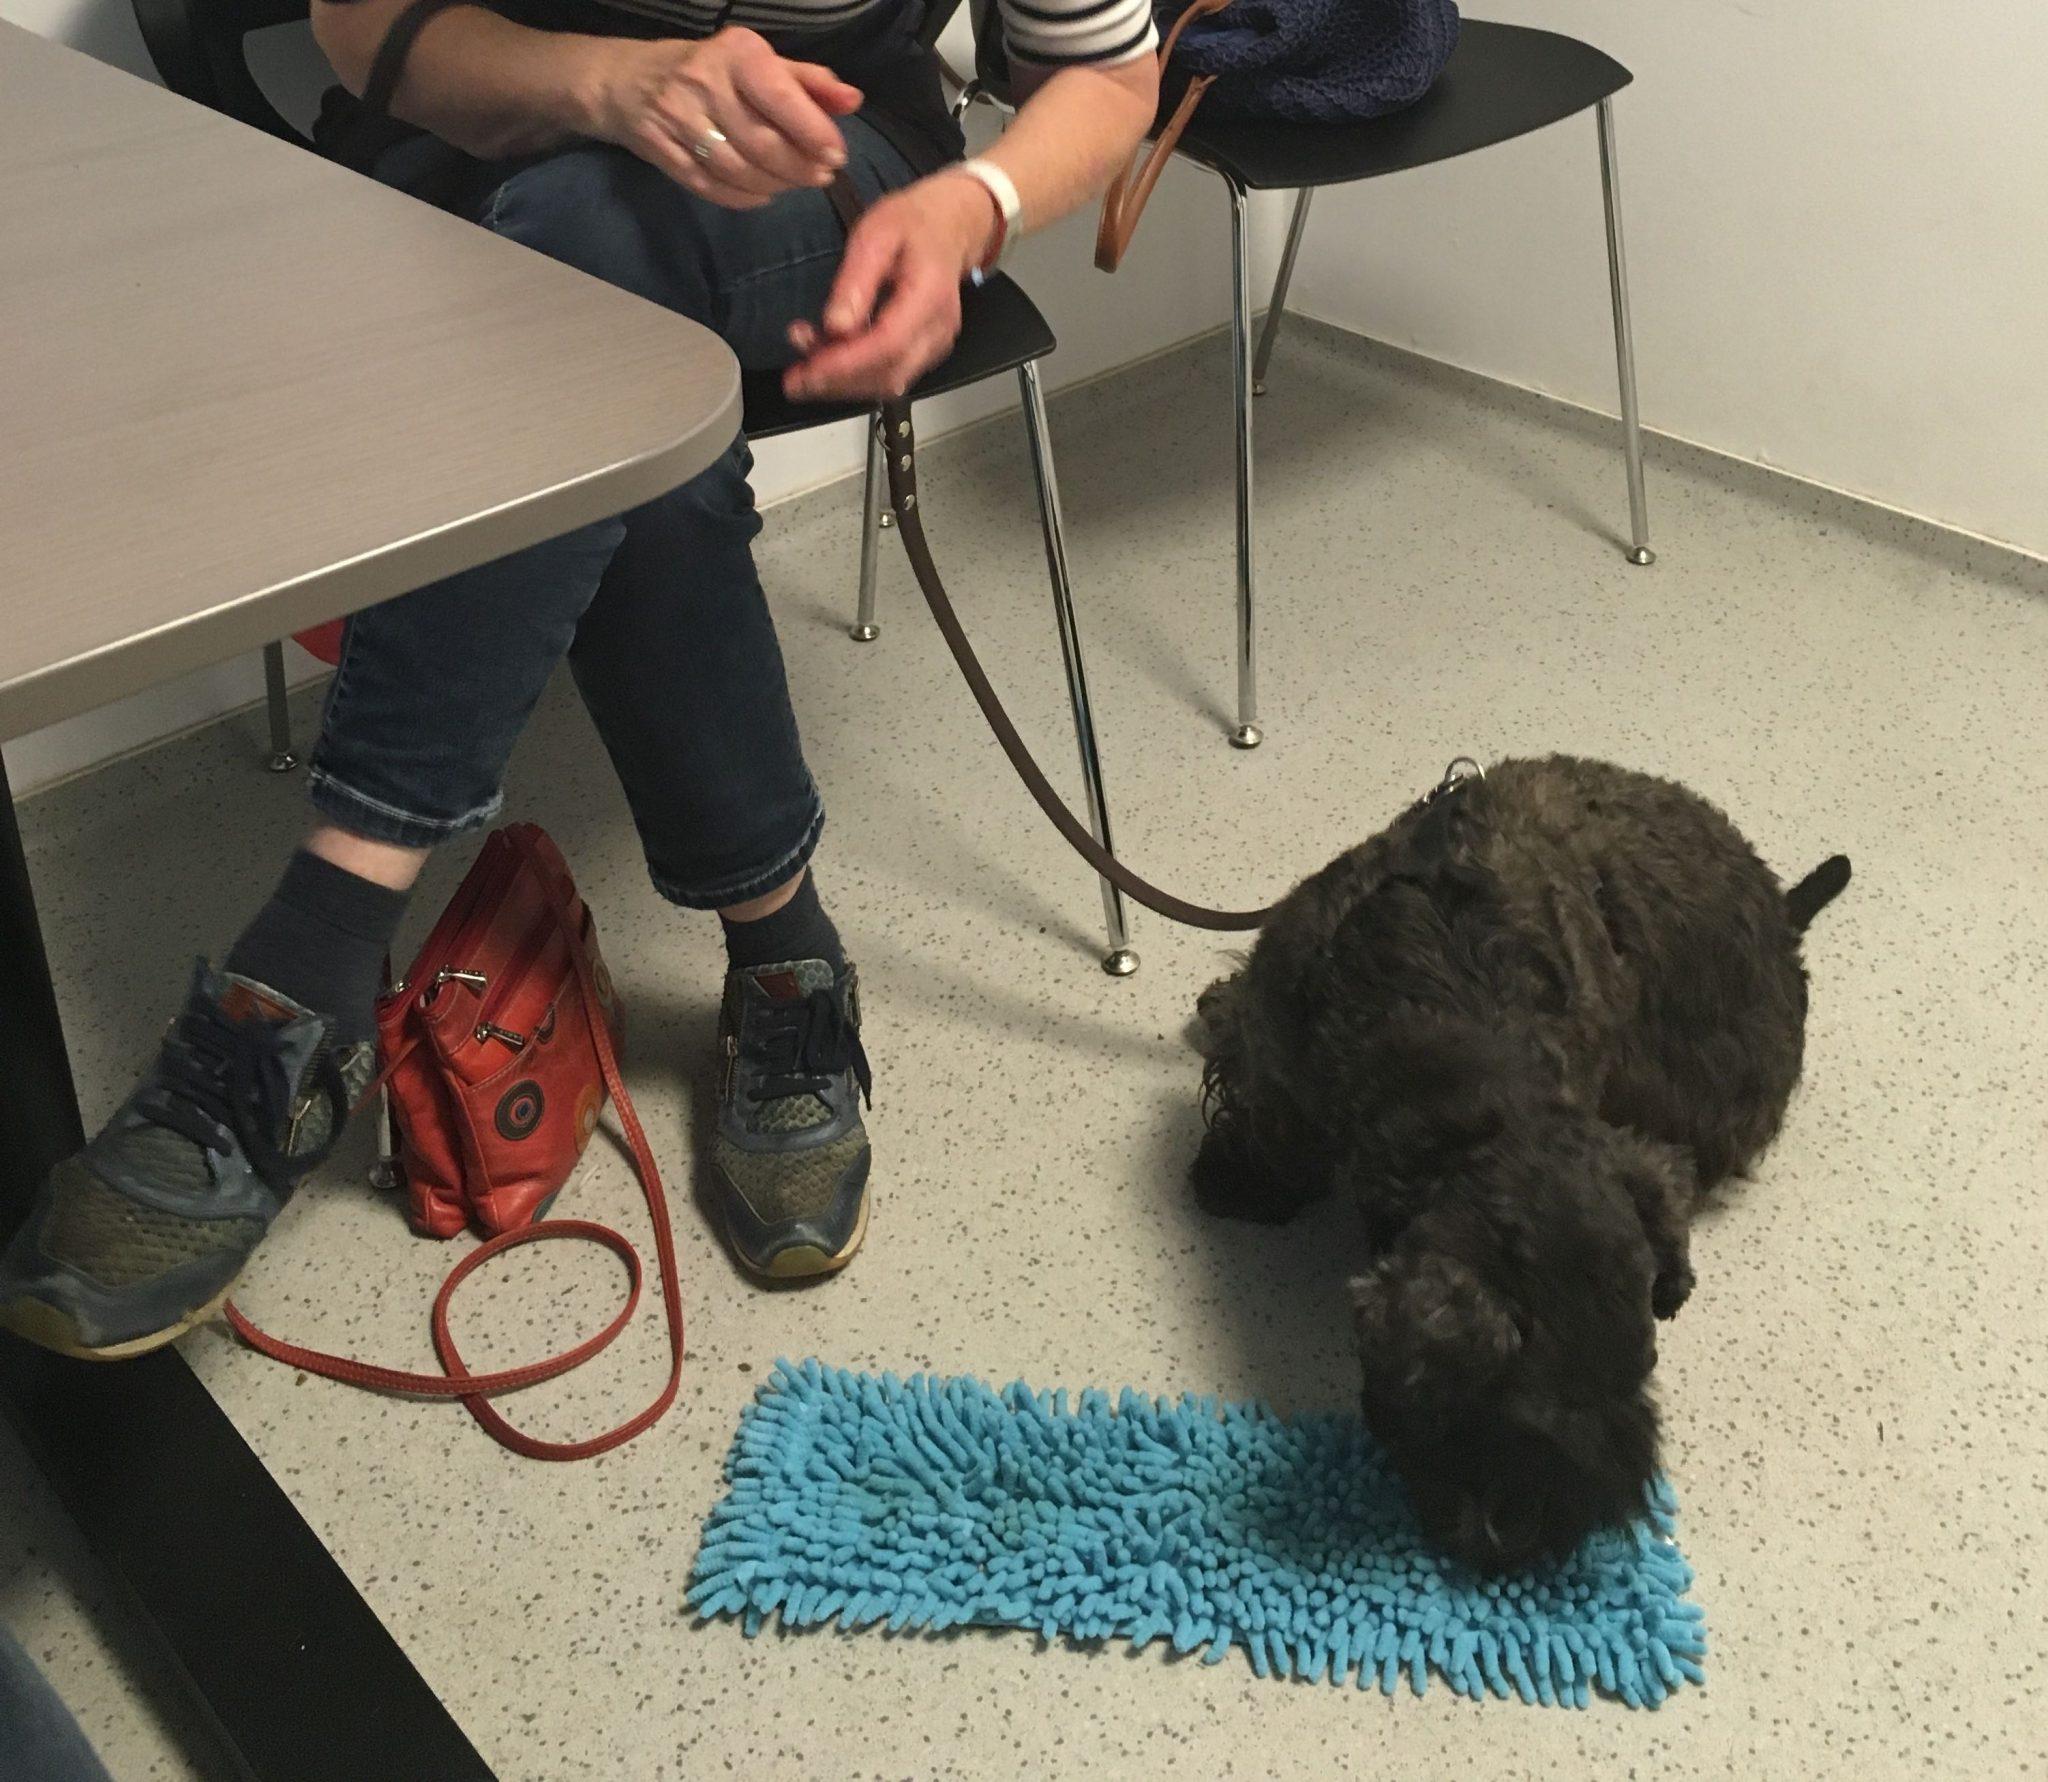 animalytics-gedrag-hond-pdcc-vuurwerk-plecy-2-valerie-jonckheer-sheehy